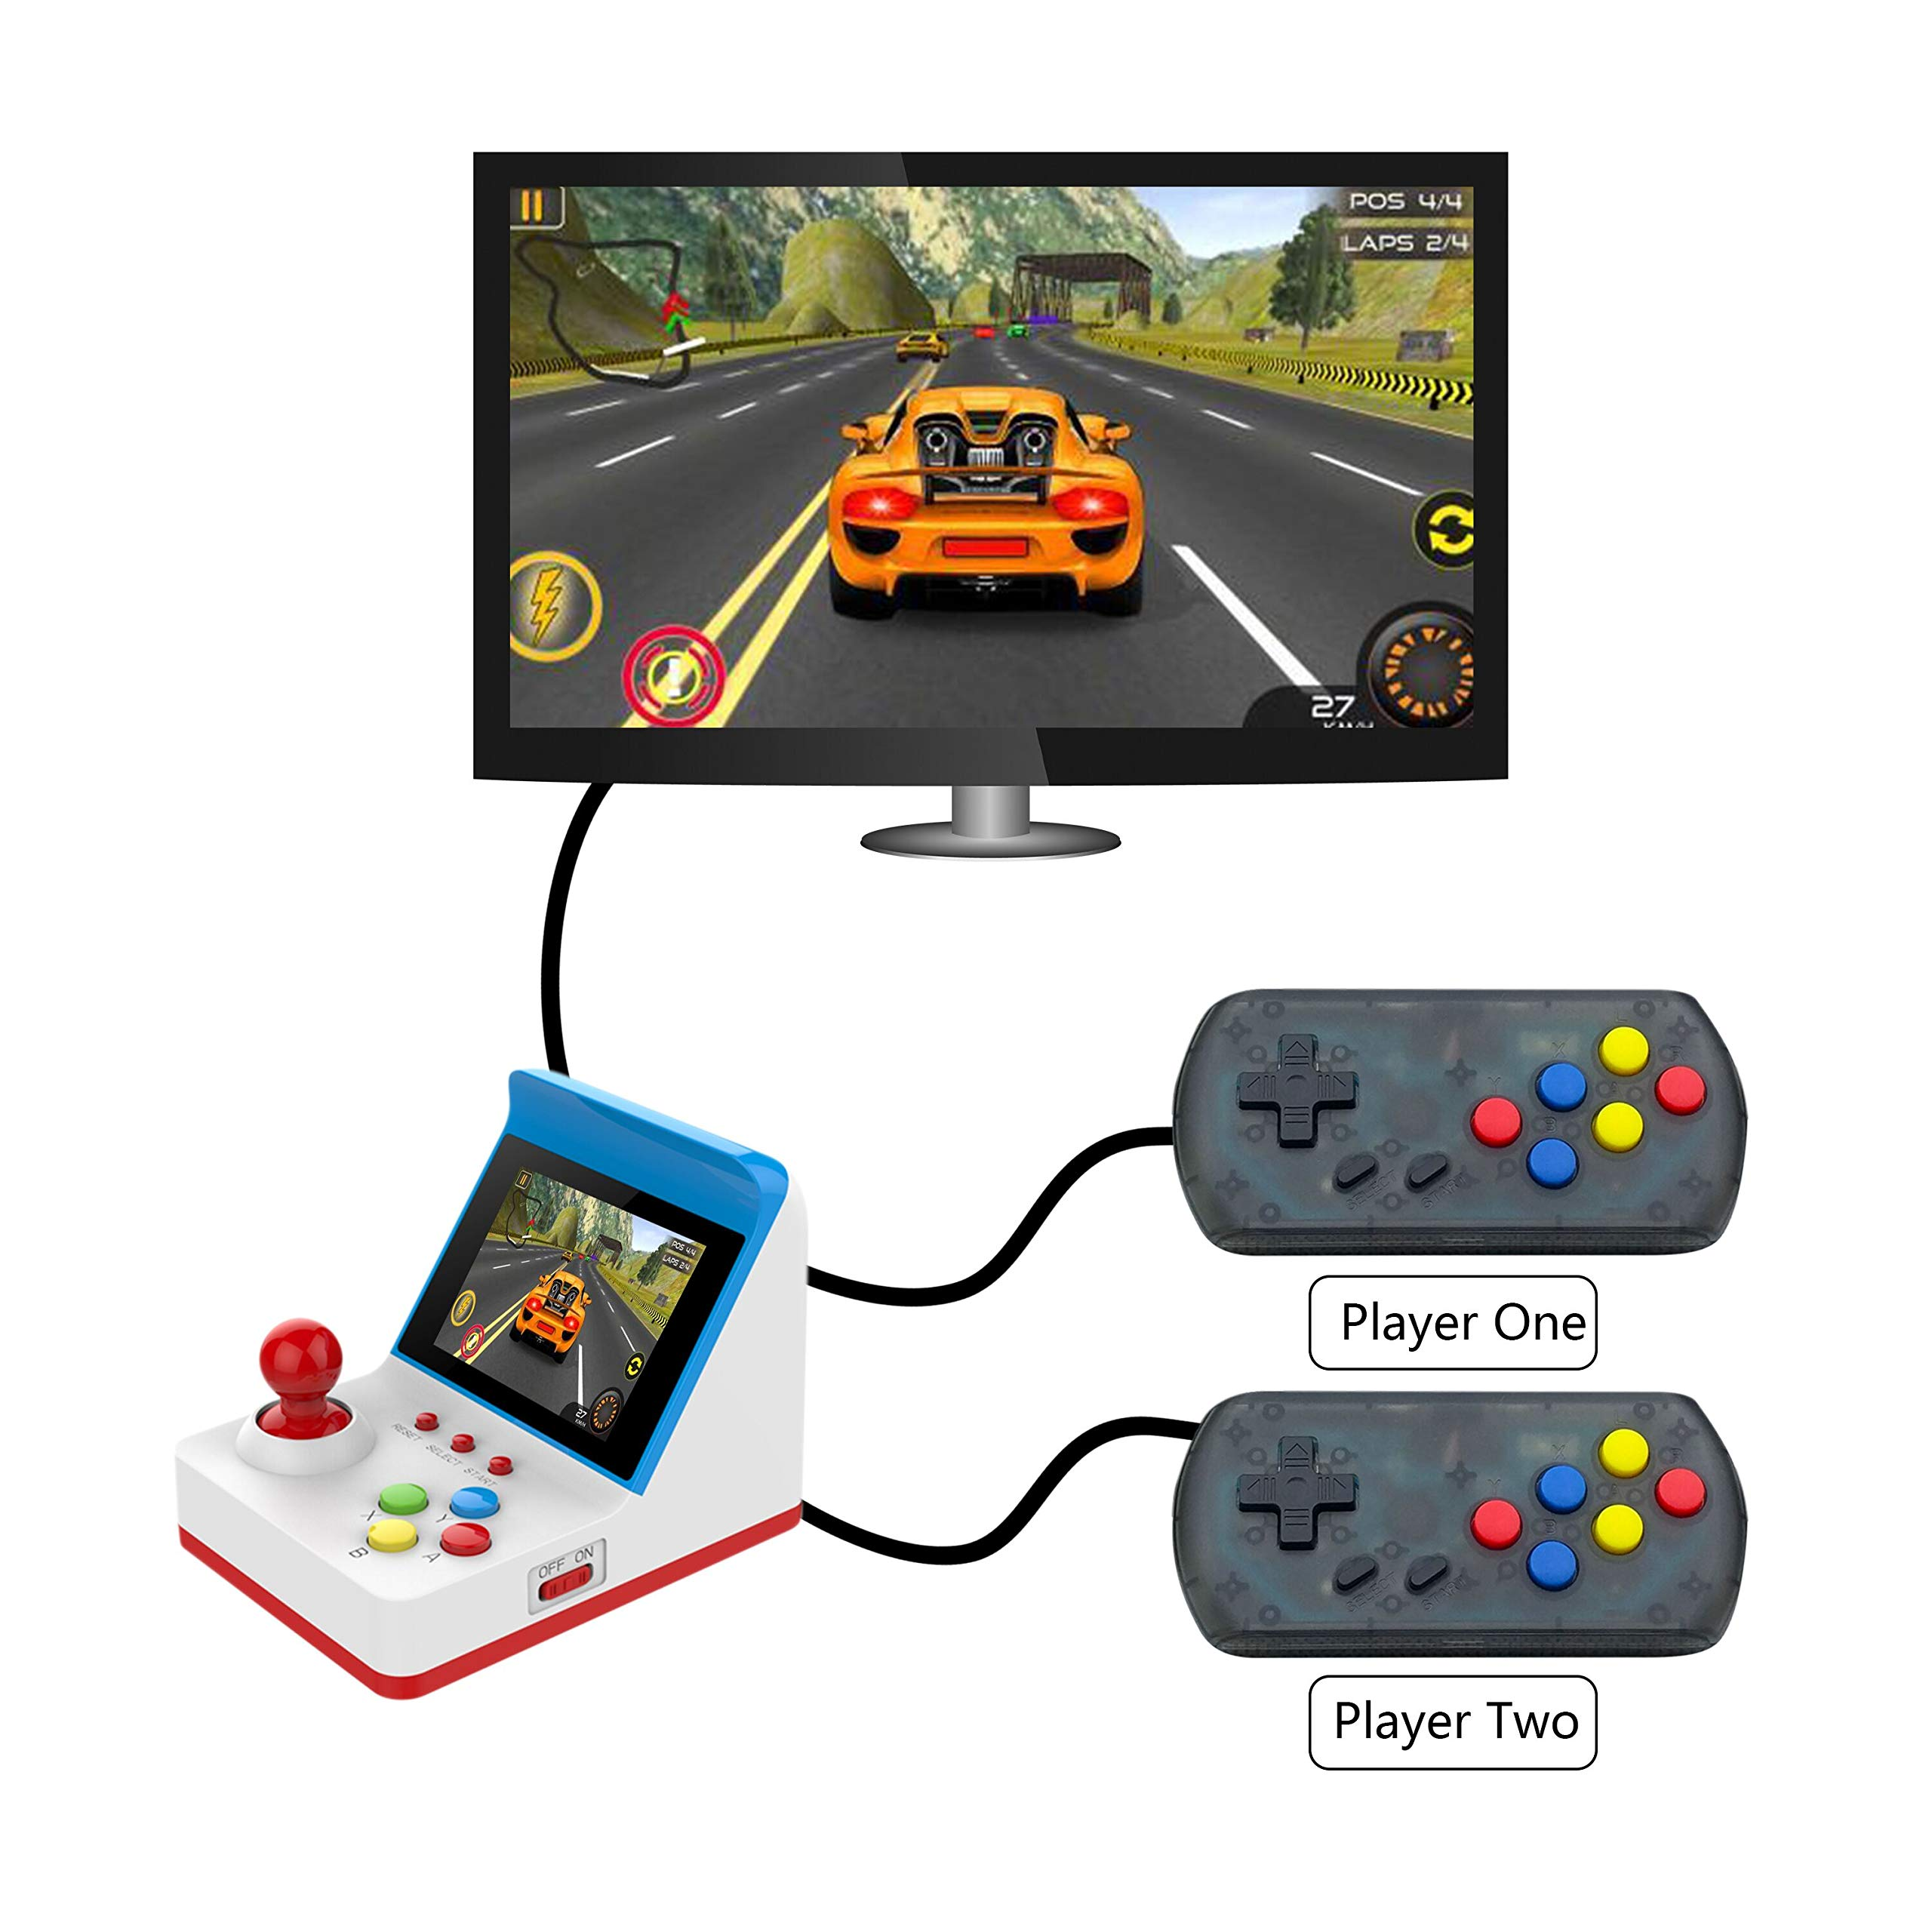 BAORUITENG Handheld Game Console, Retro FC Game Console Video Game Console with 3 Inch 360 Classic Games with 2 Joysticks , Birthday Present for Children (red) by BAORUITENG (Image #6)